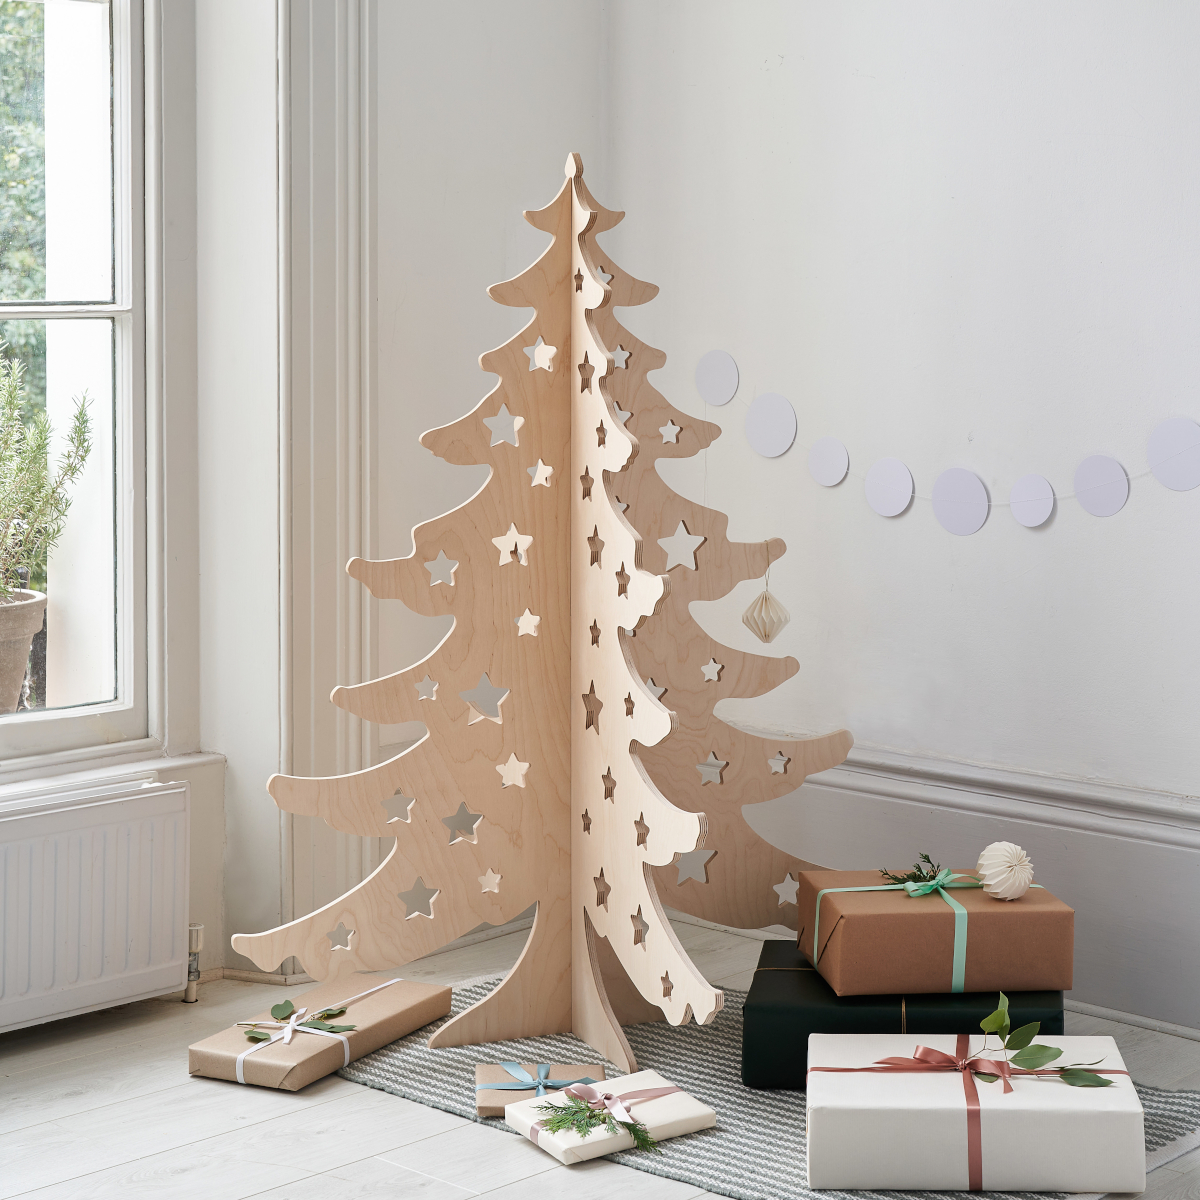 4ft Alternative Wooden Christmas Tree by Bombus